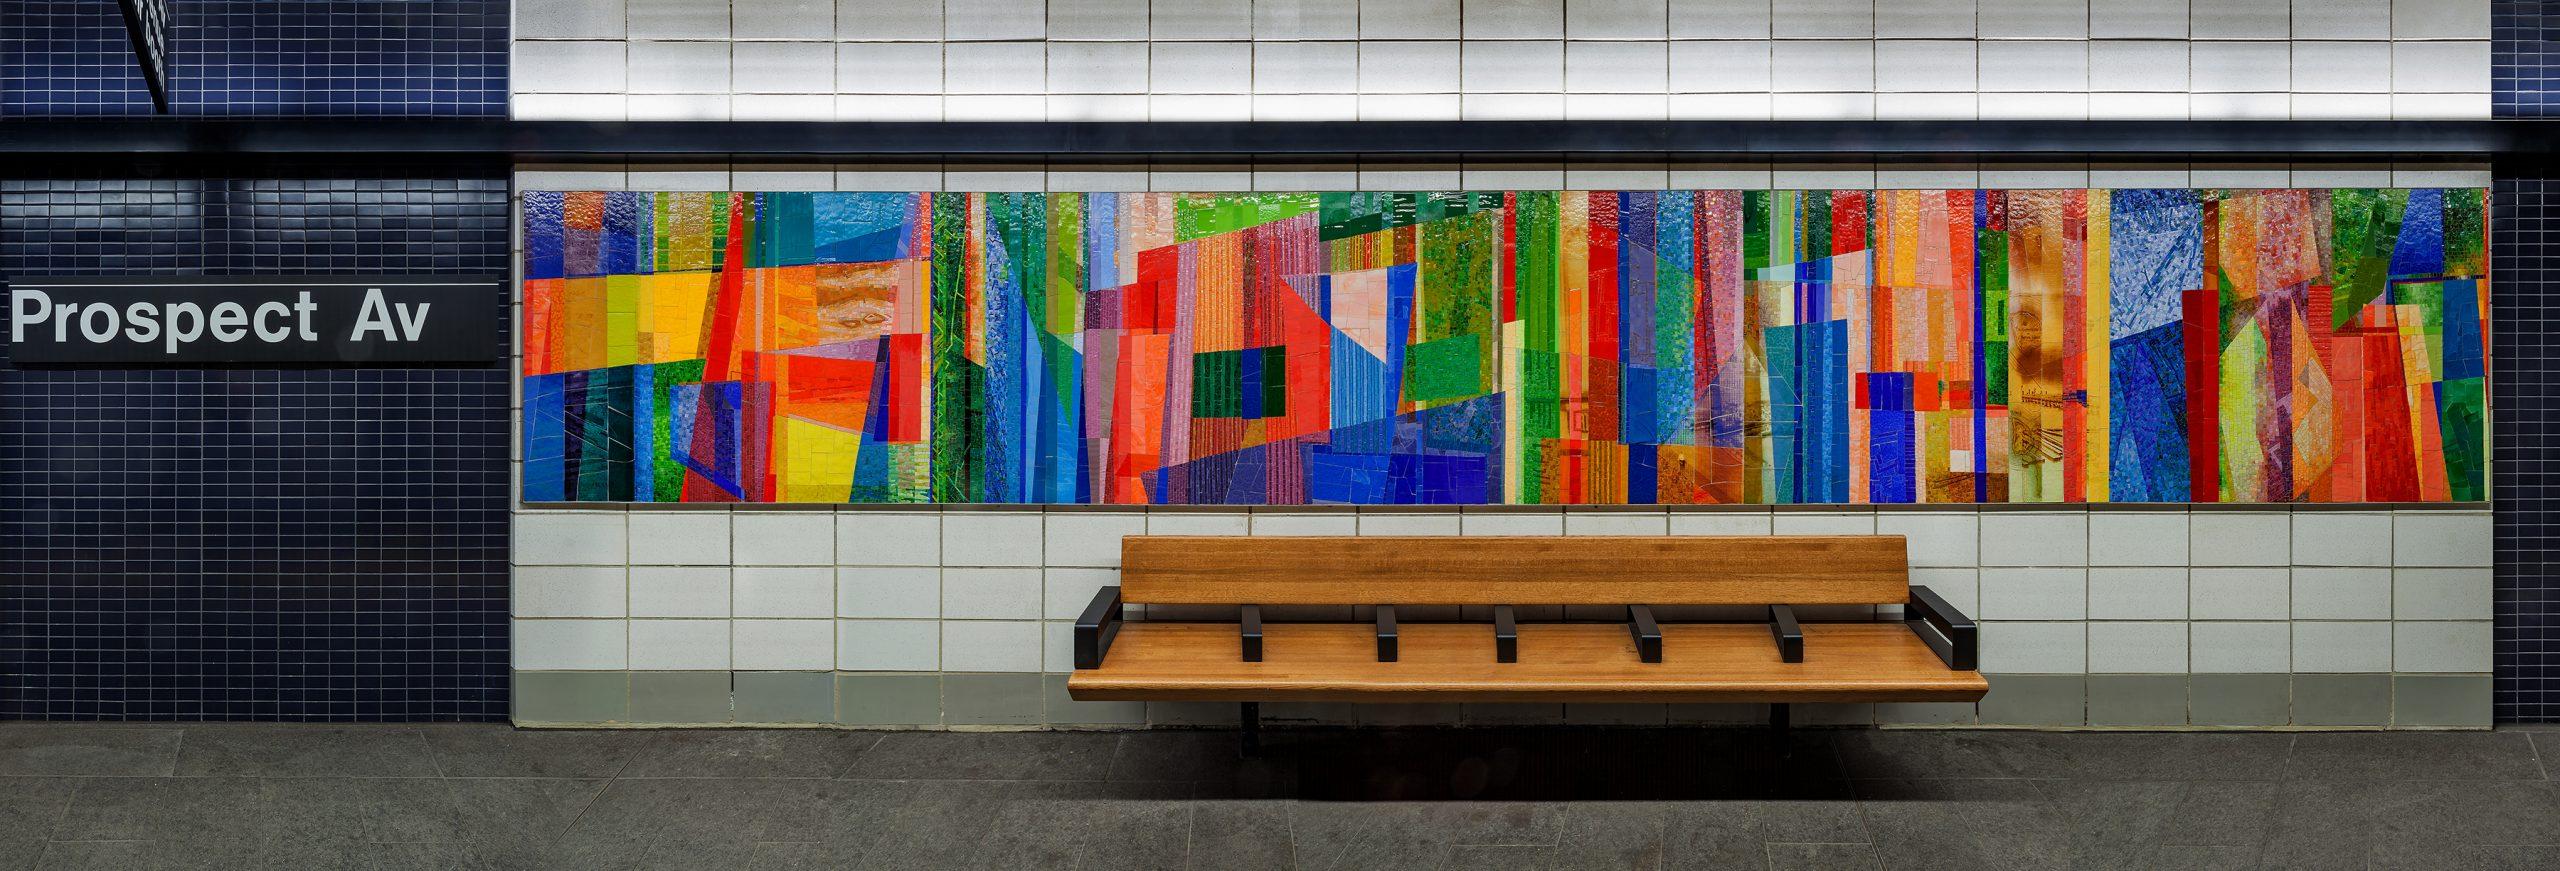 Duration- Prospect Avenue subway station